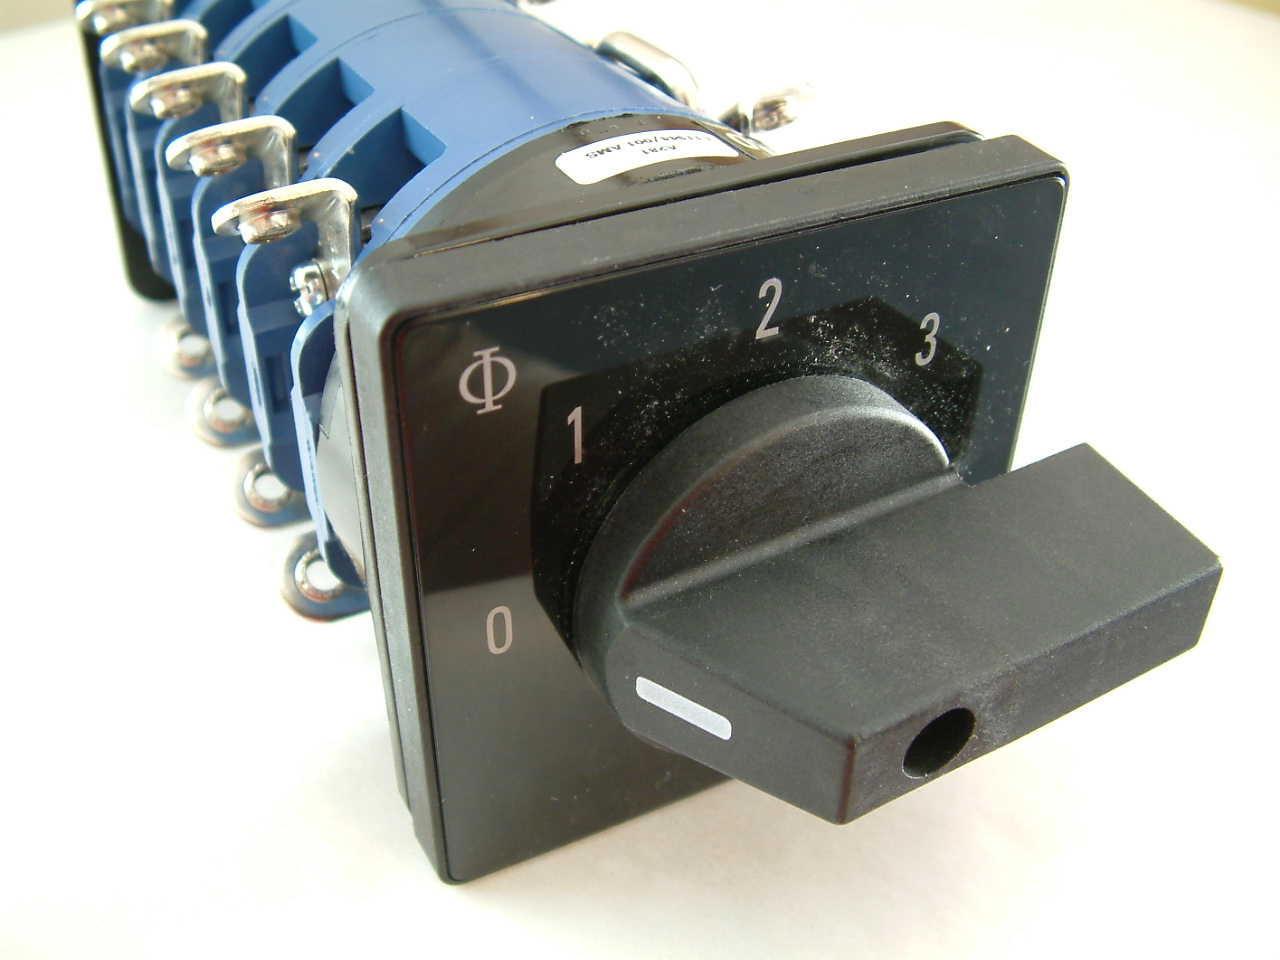 prod_16_C80A281_01 kraus naimer ca 10 wiring diagram kraus naimer switch development kraus & naimer ca11 wiring diagram at reclaimingppi.co